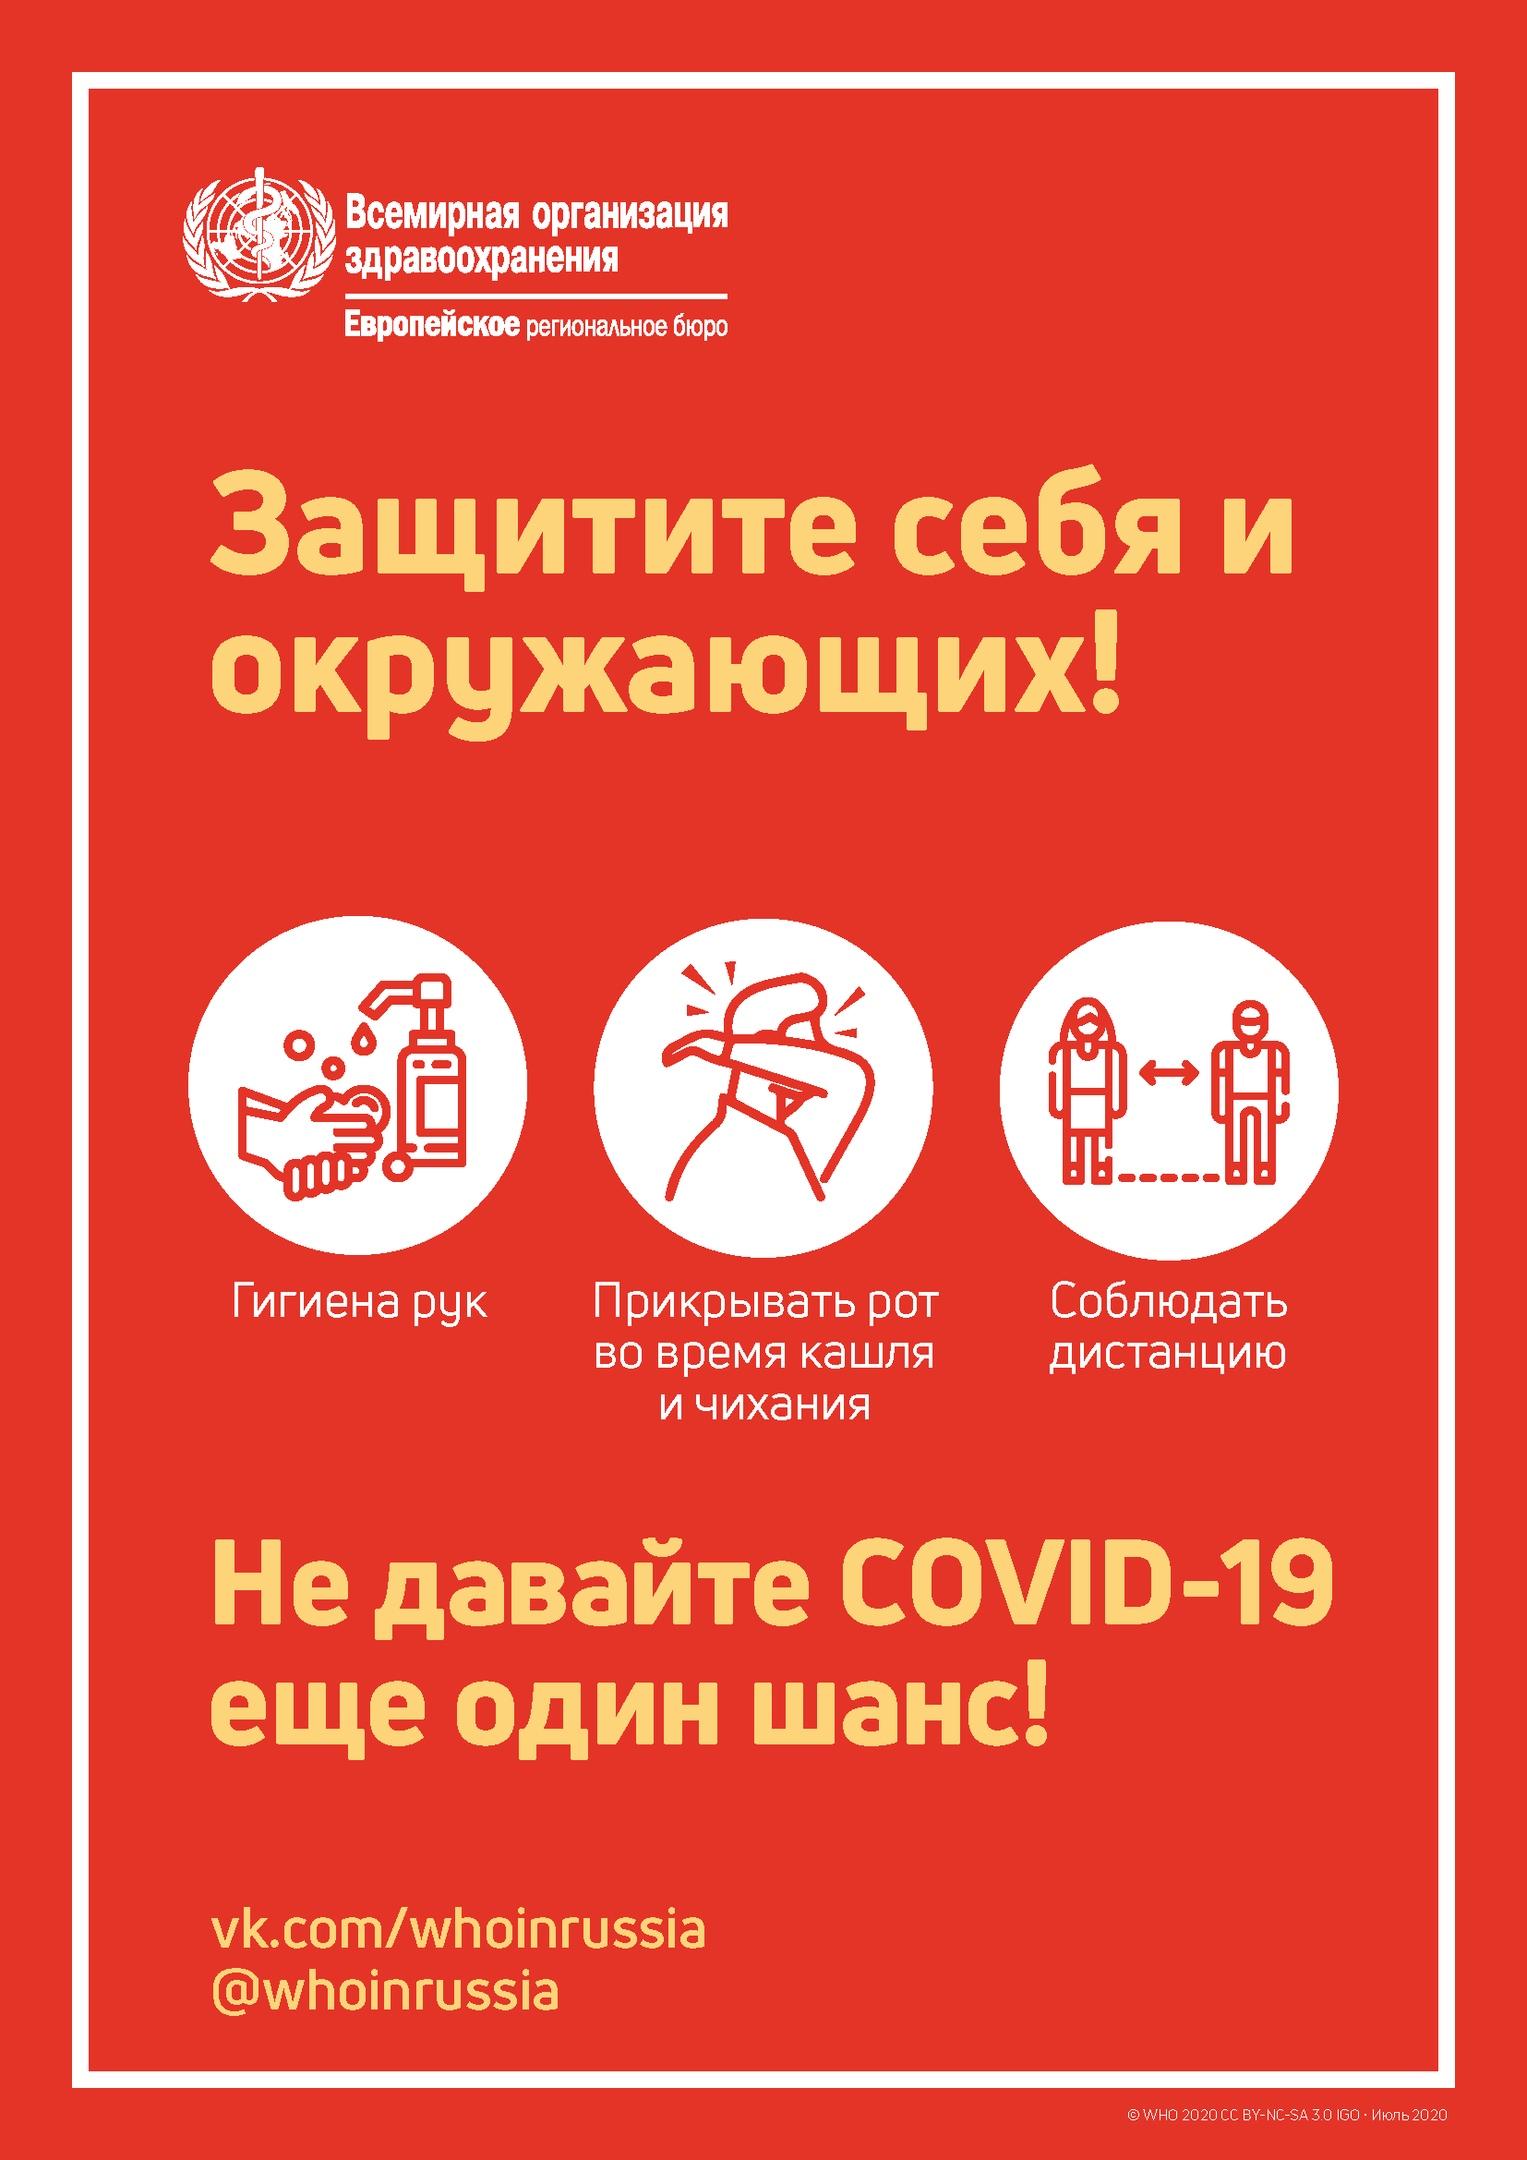 #coronavirus #covid19 #ВОЗ